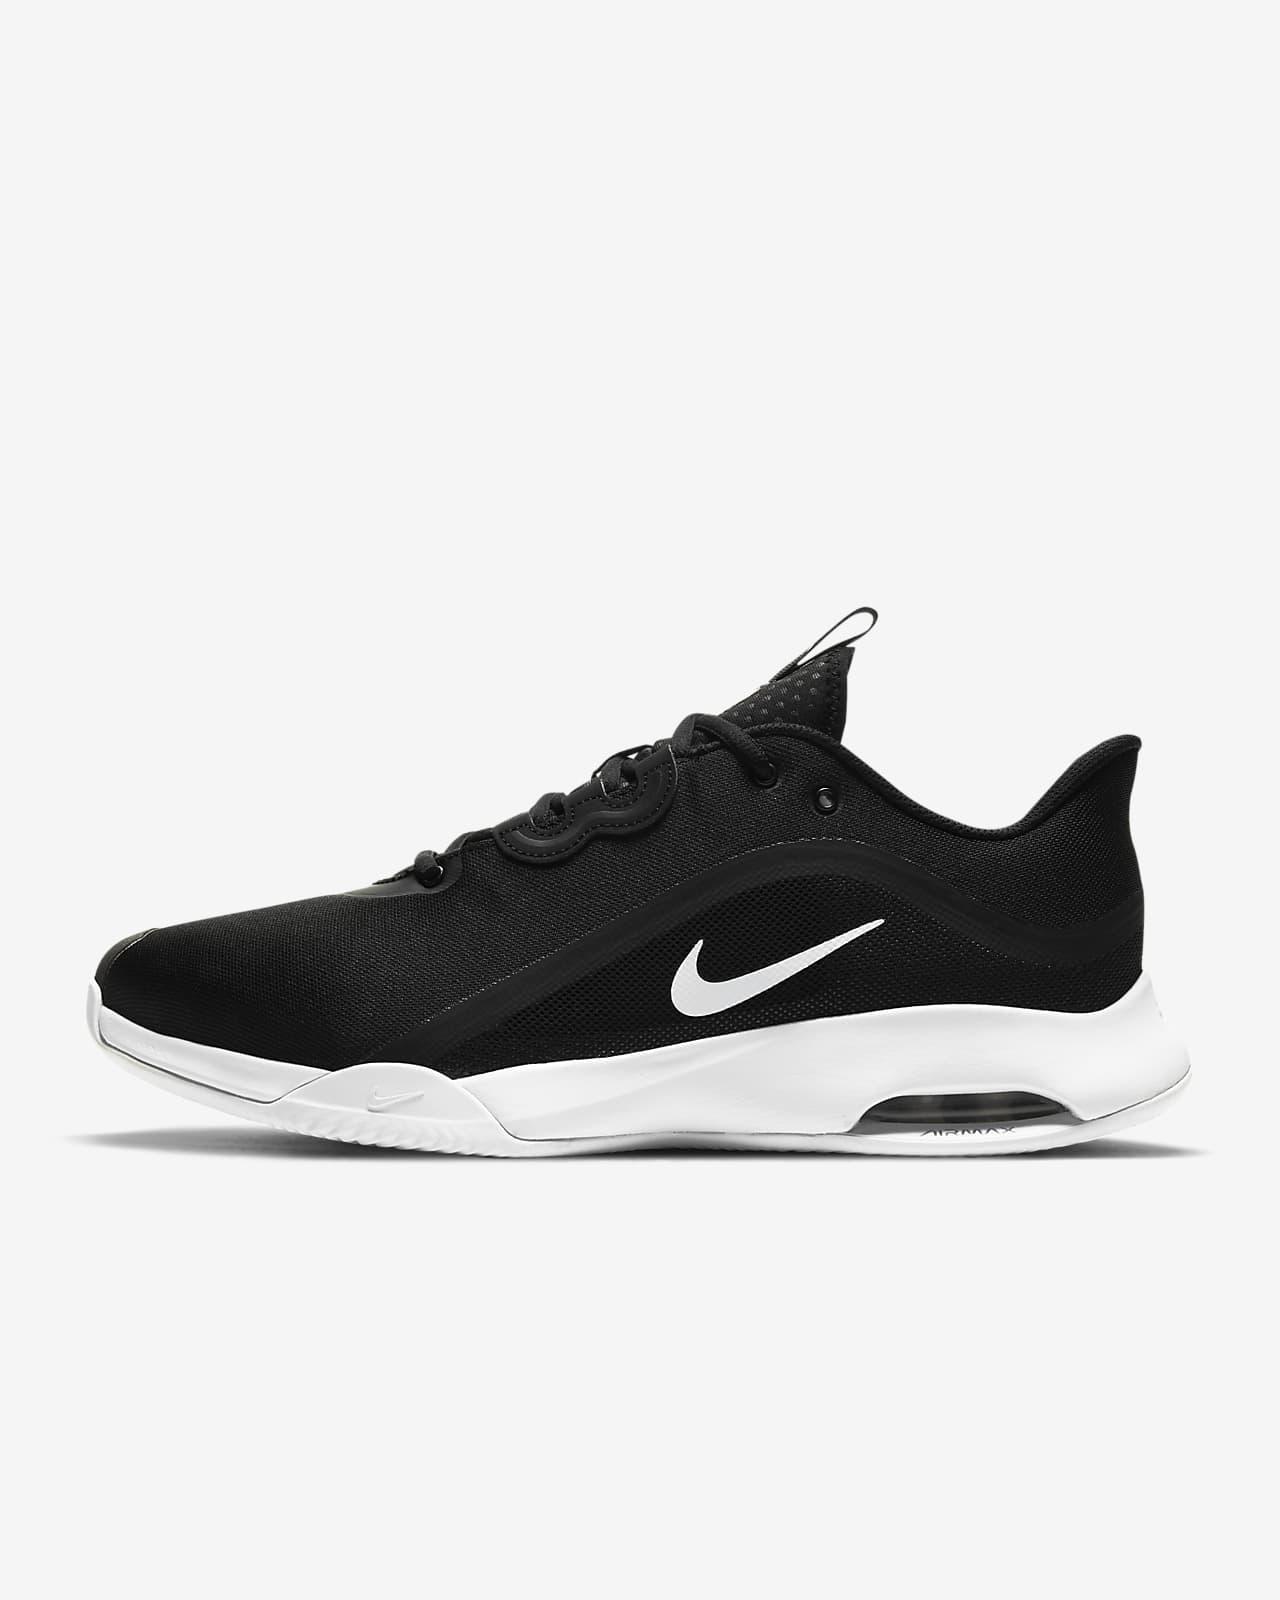 NikeCourt Air Max Volley Men's Clay Tennis Shoe